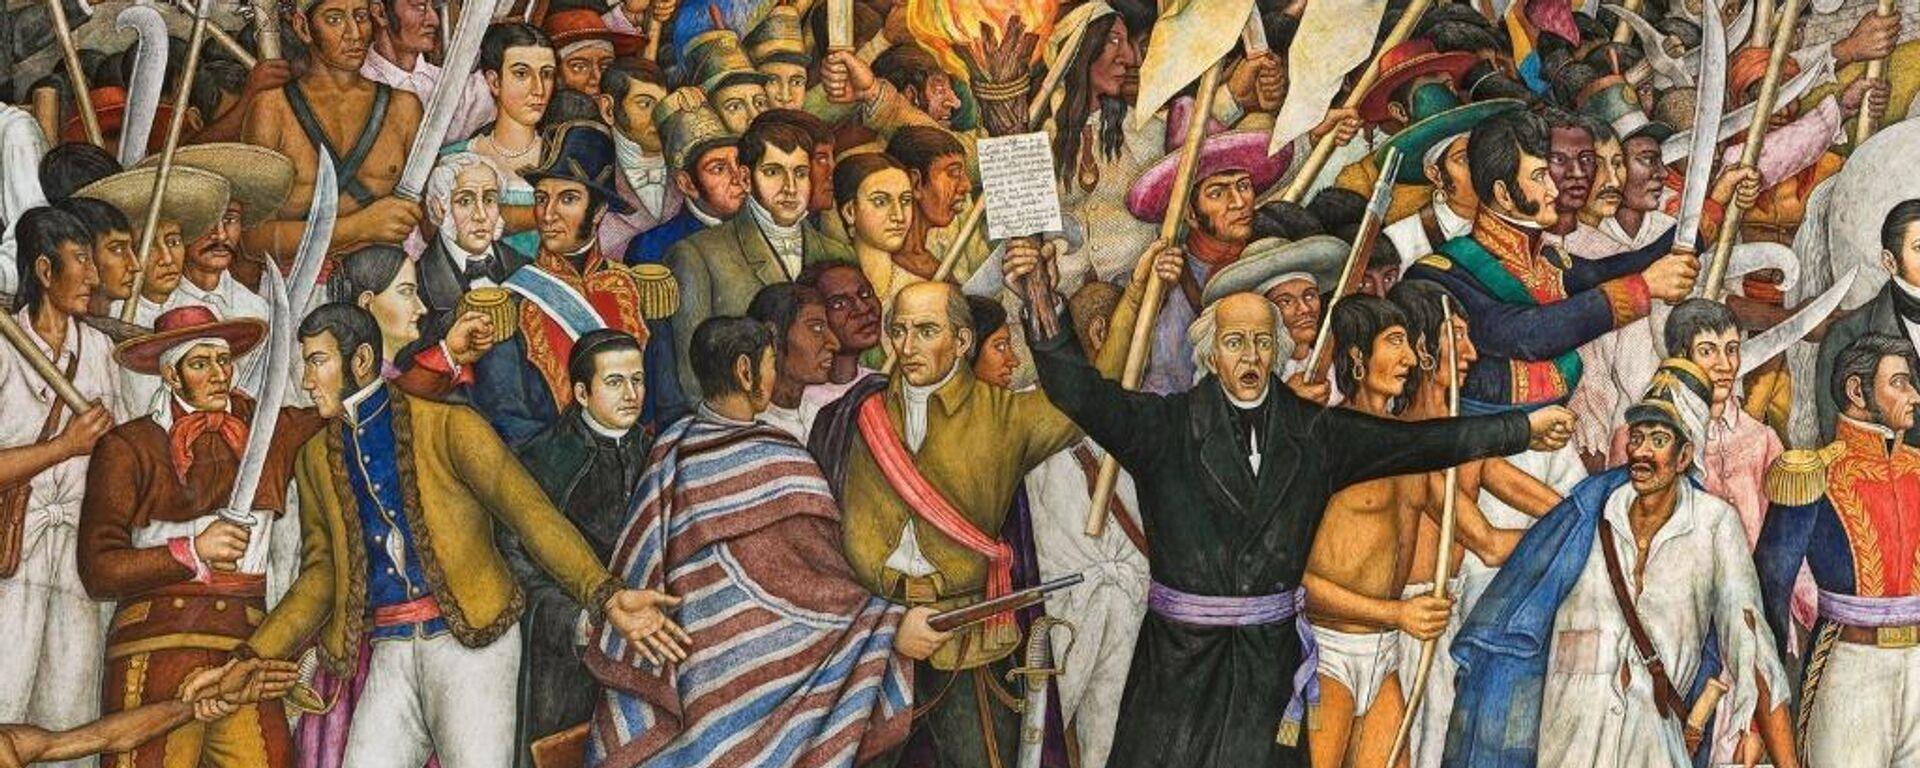 Retablo de la Independencia - Sputnik Mundo, 1920, 15.09.2021